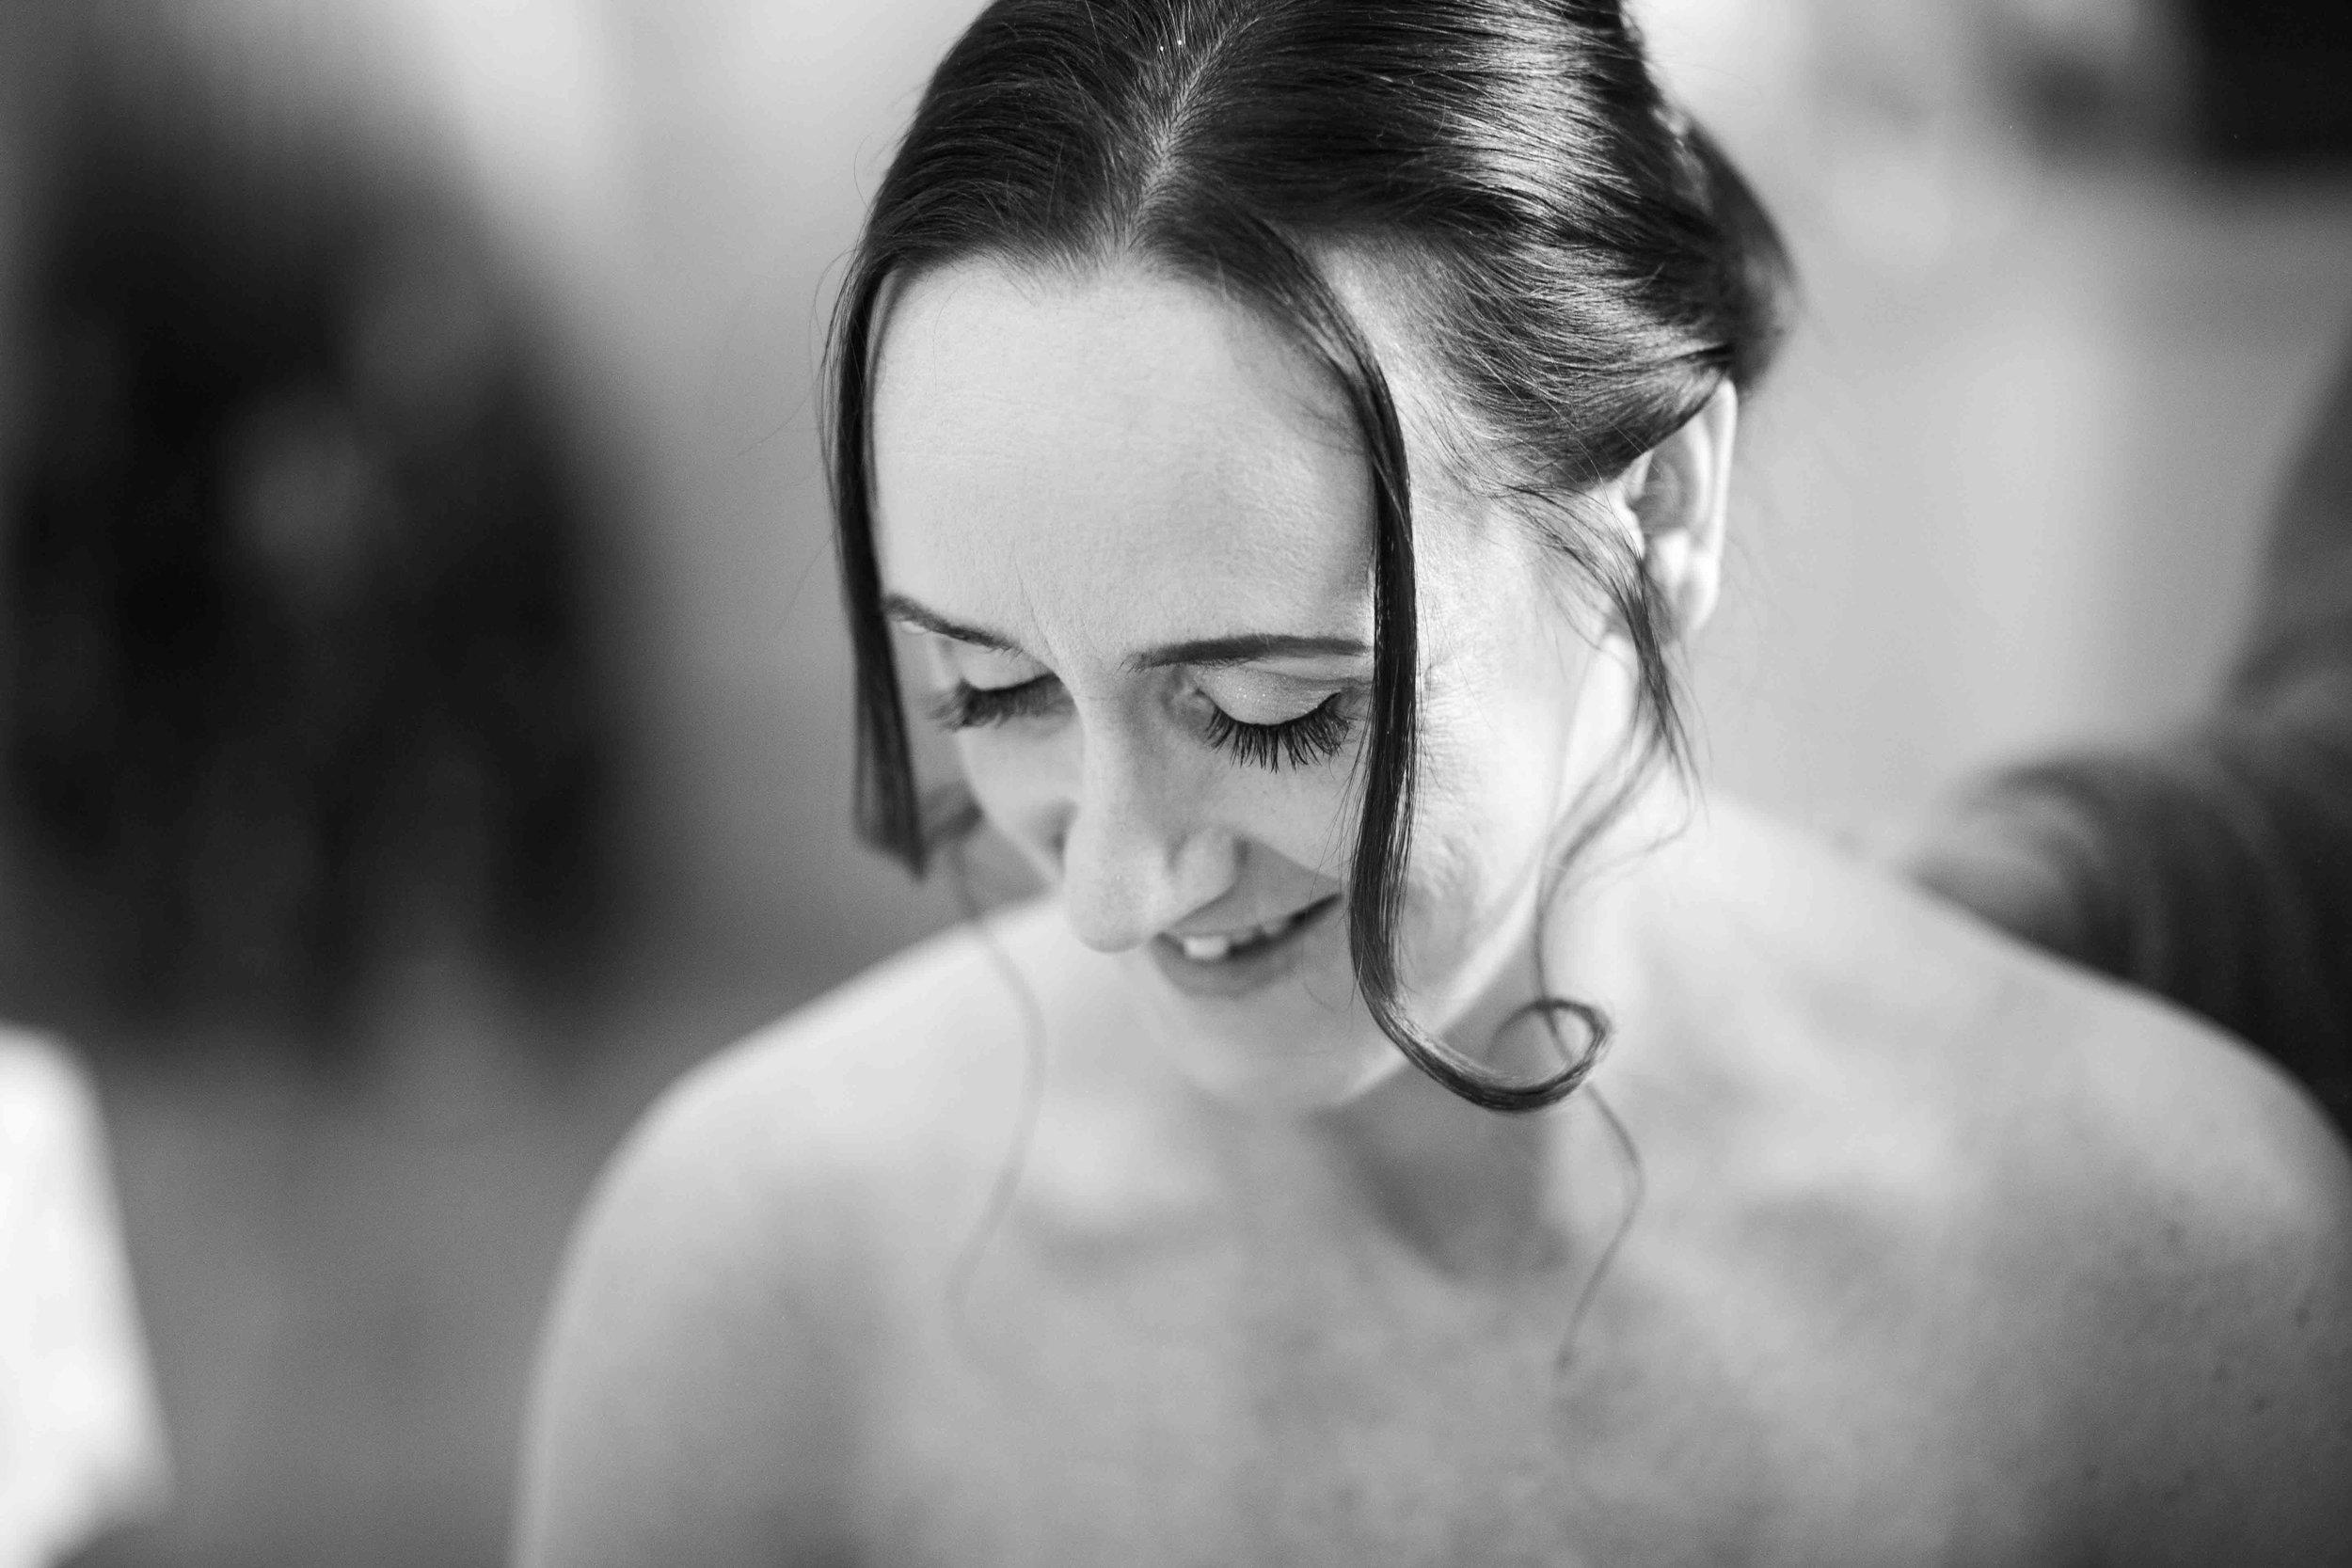 wedding-photos-willenhall-wedding-photographer-wolverhampton-wedding-photographer-west-midlands-wedding-photographer-birmingham-bride-close-up.jpg